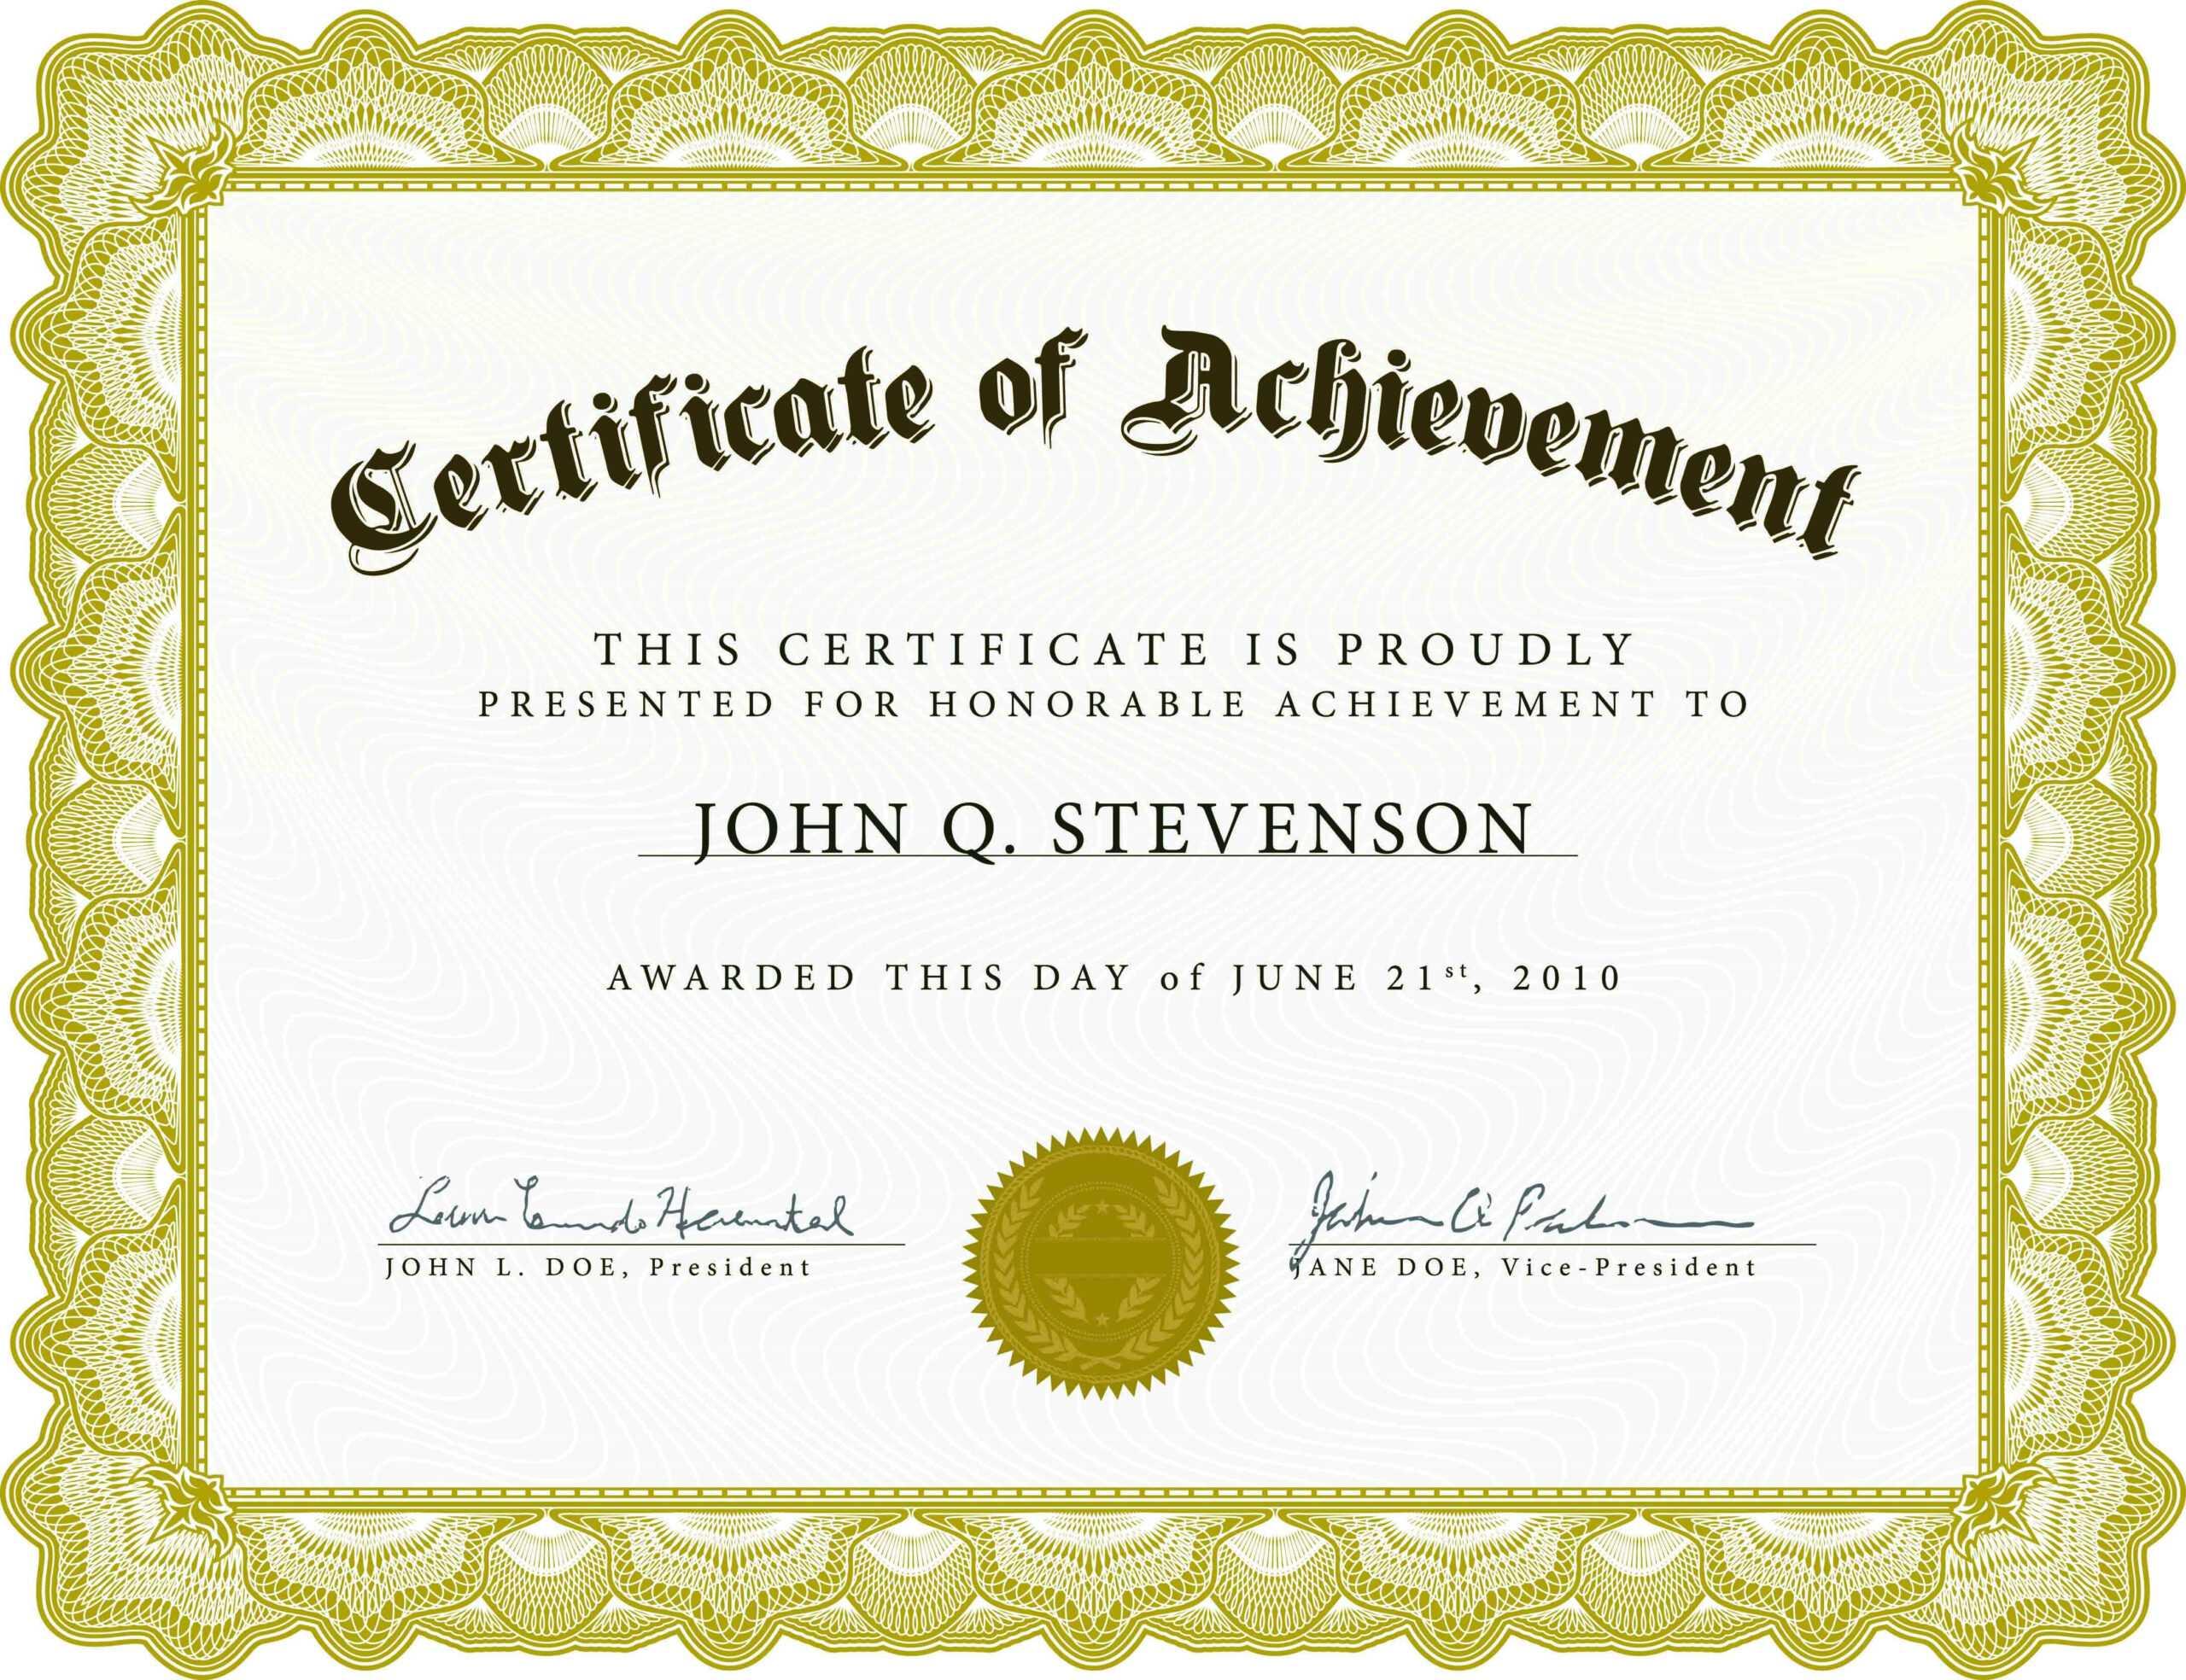 Farewell Certificate Template - Professional Template With Farewell Certificate Template